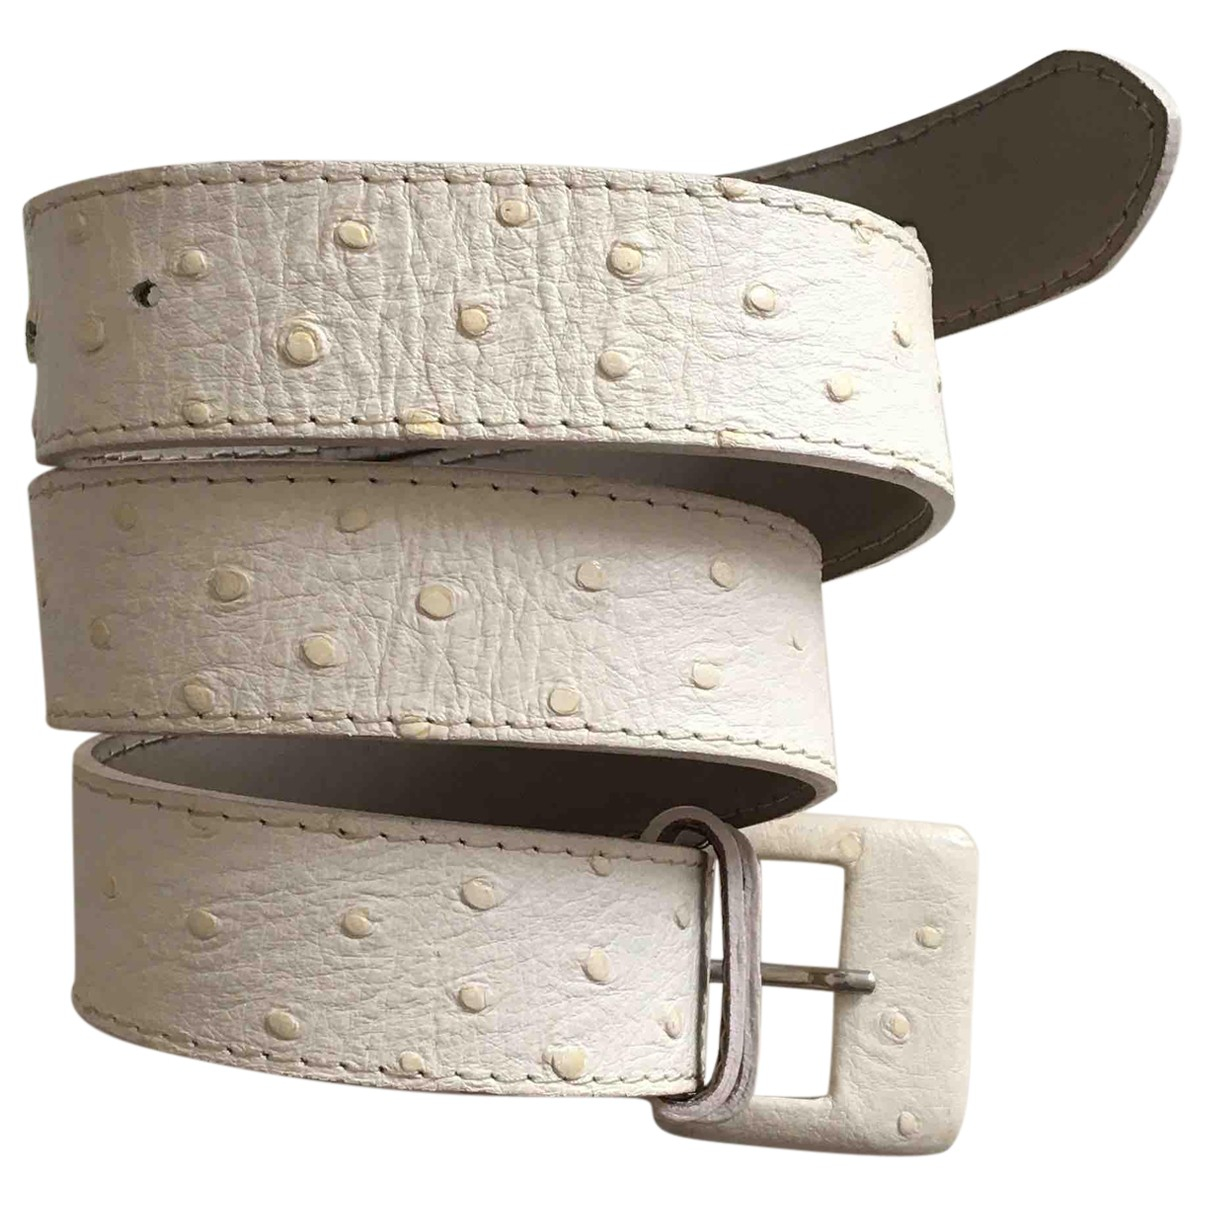 Alberta Ferretti N White Leather belt for Women 80 cm